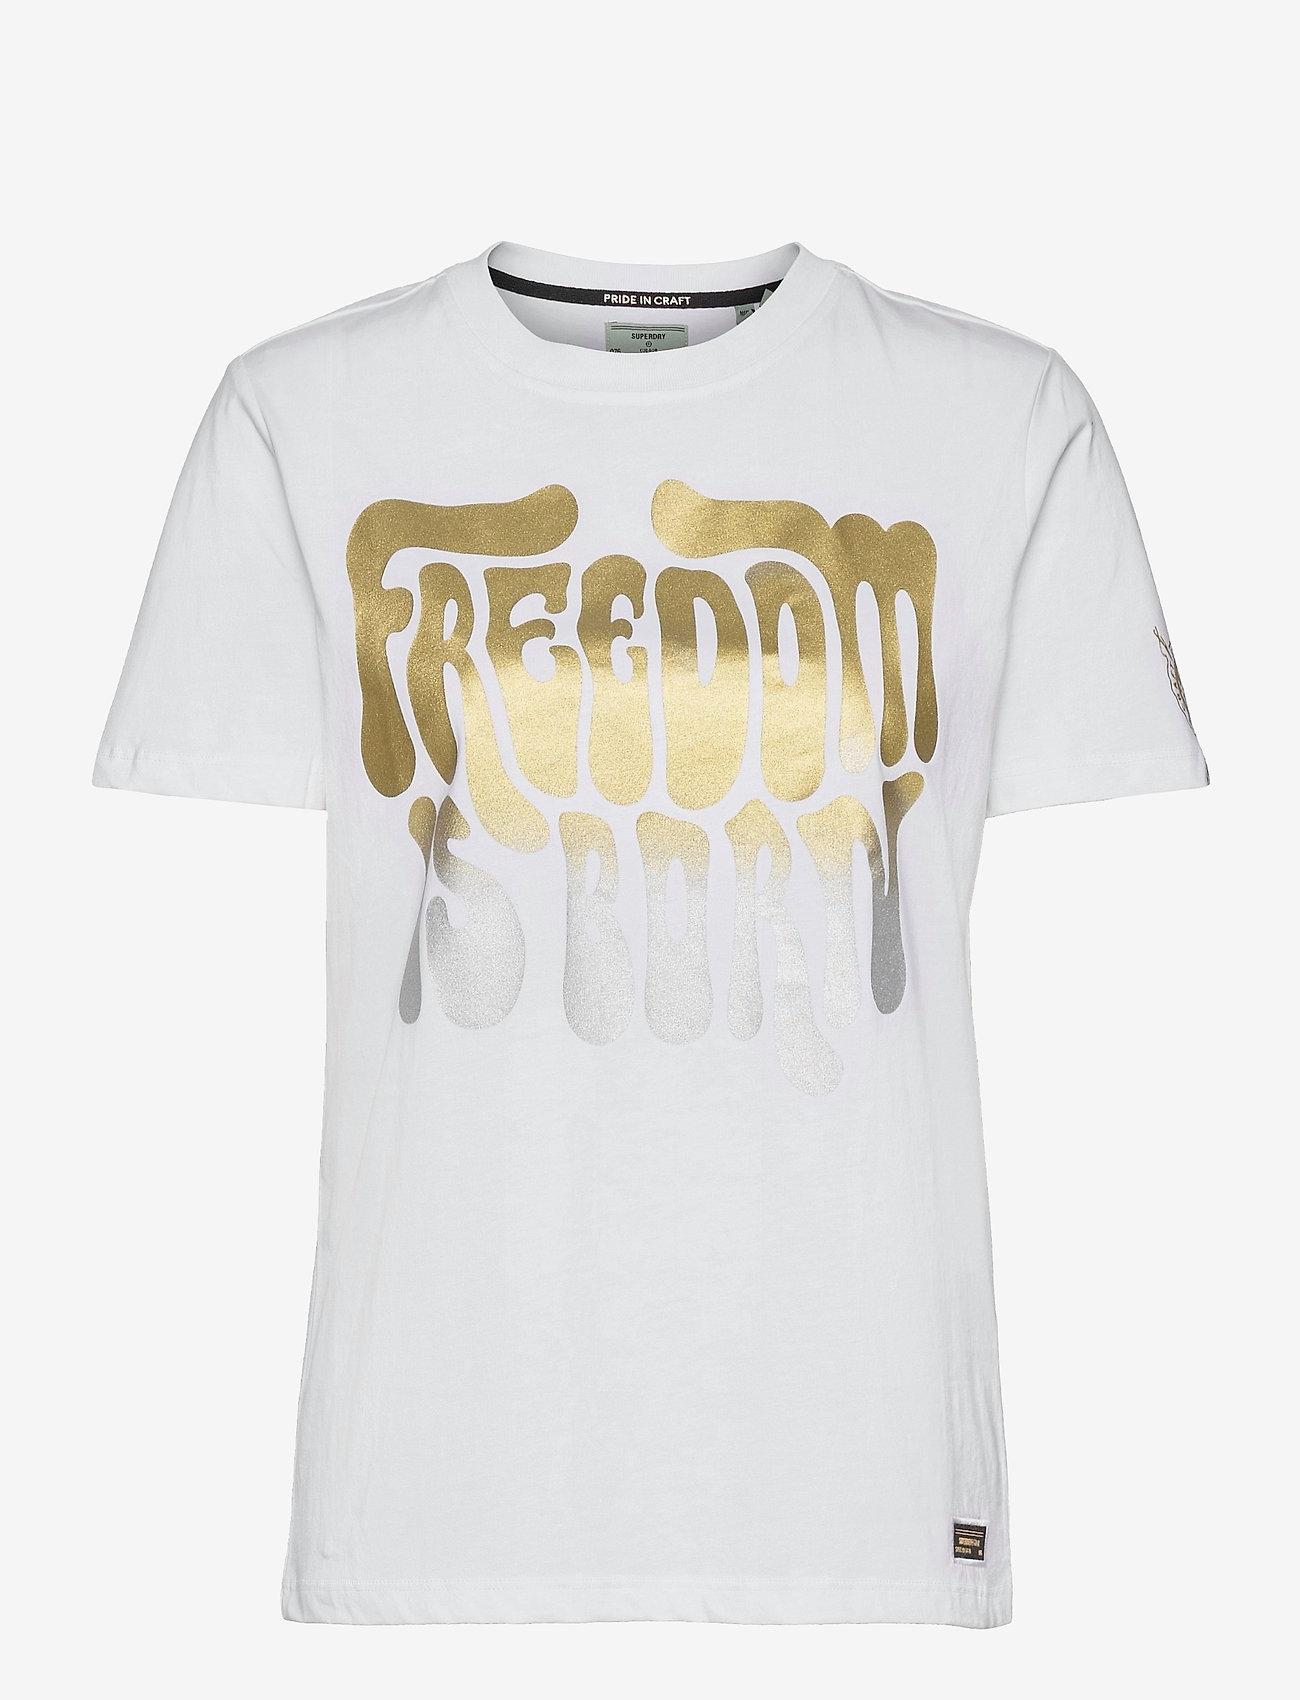 Superdry - MILITARY NARRATIVE TEE - t-shirts - brilliant white - 0